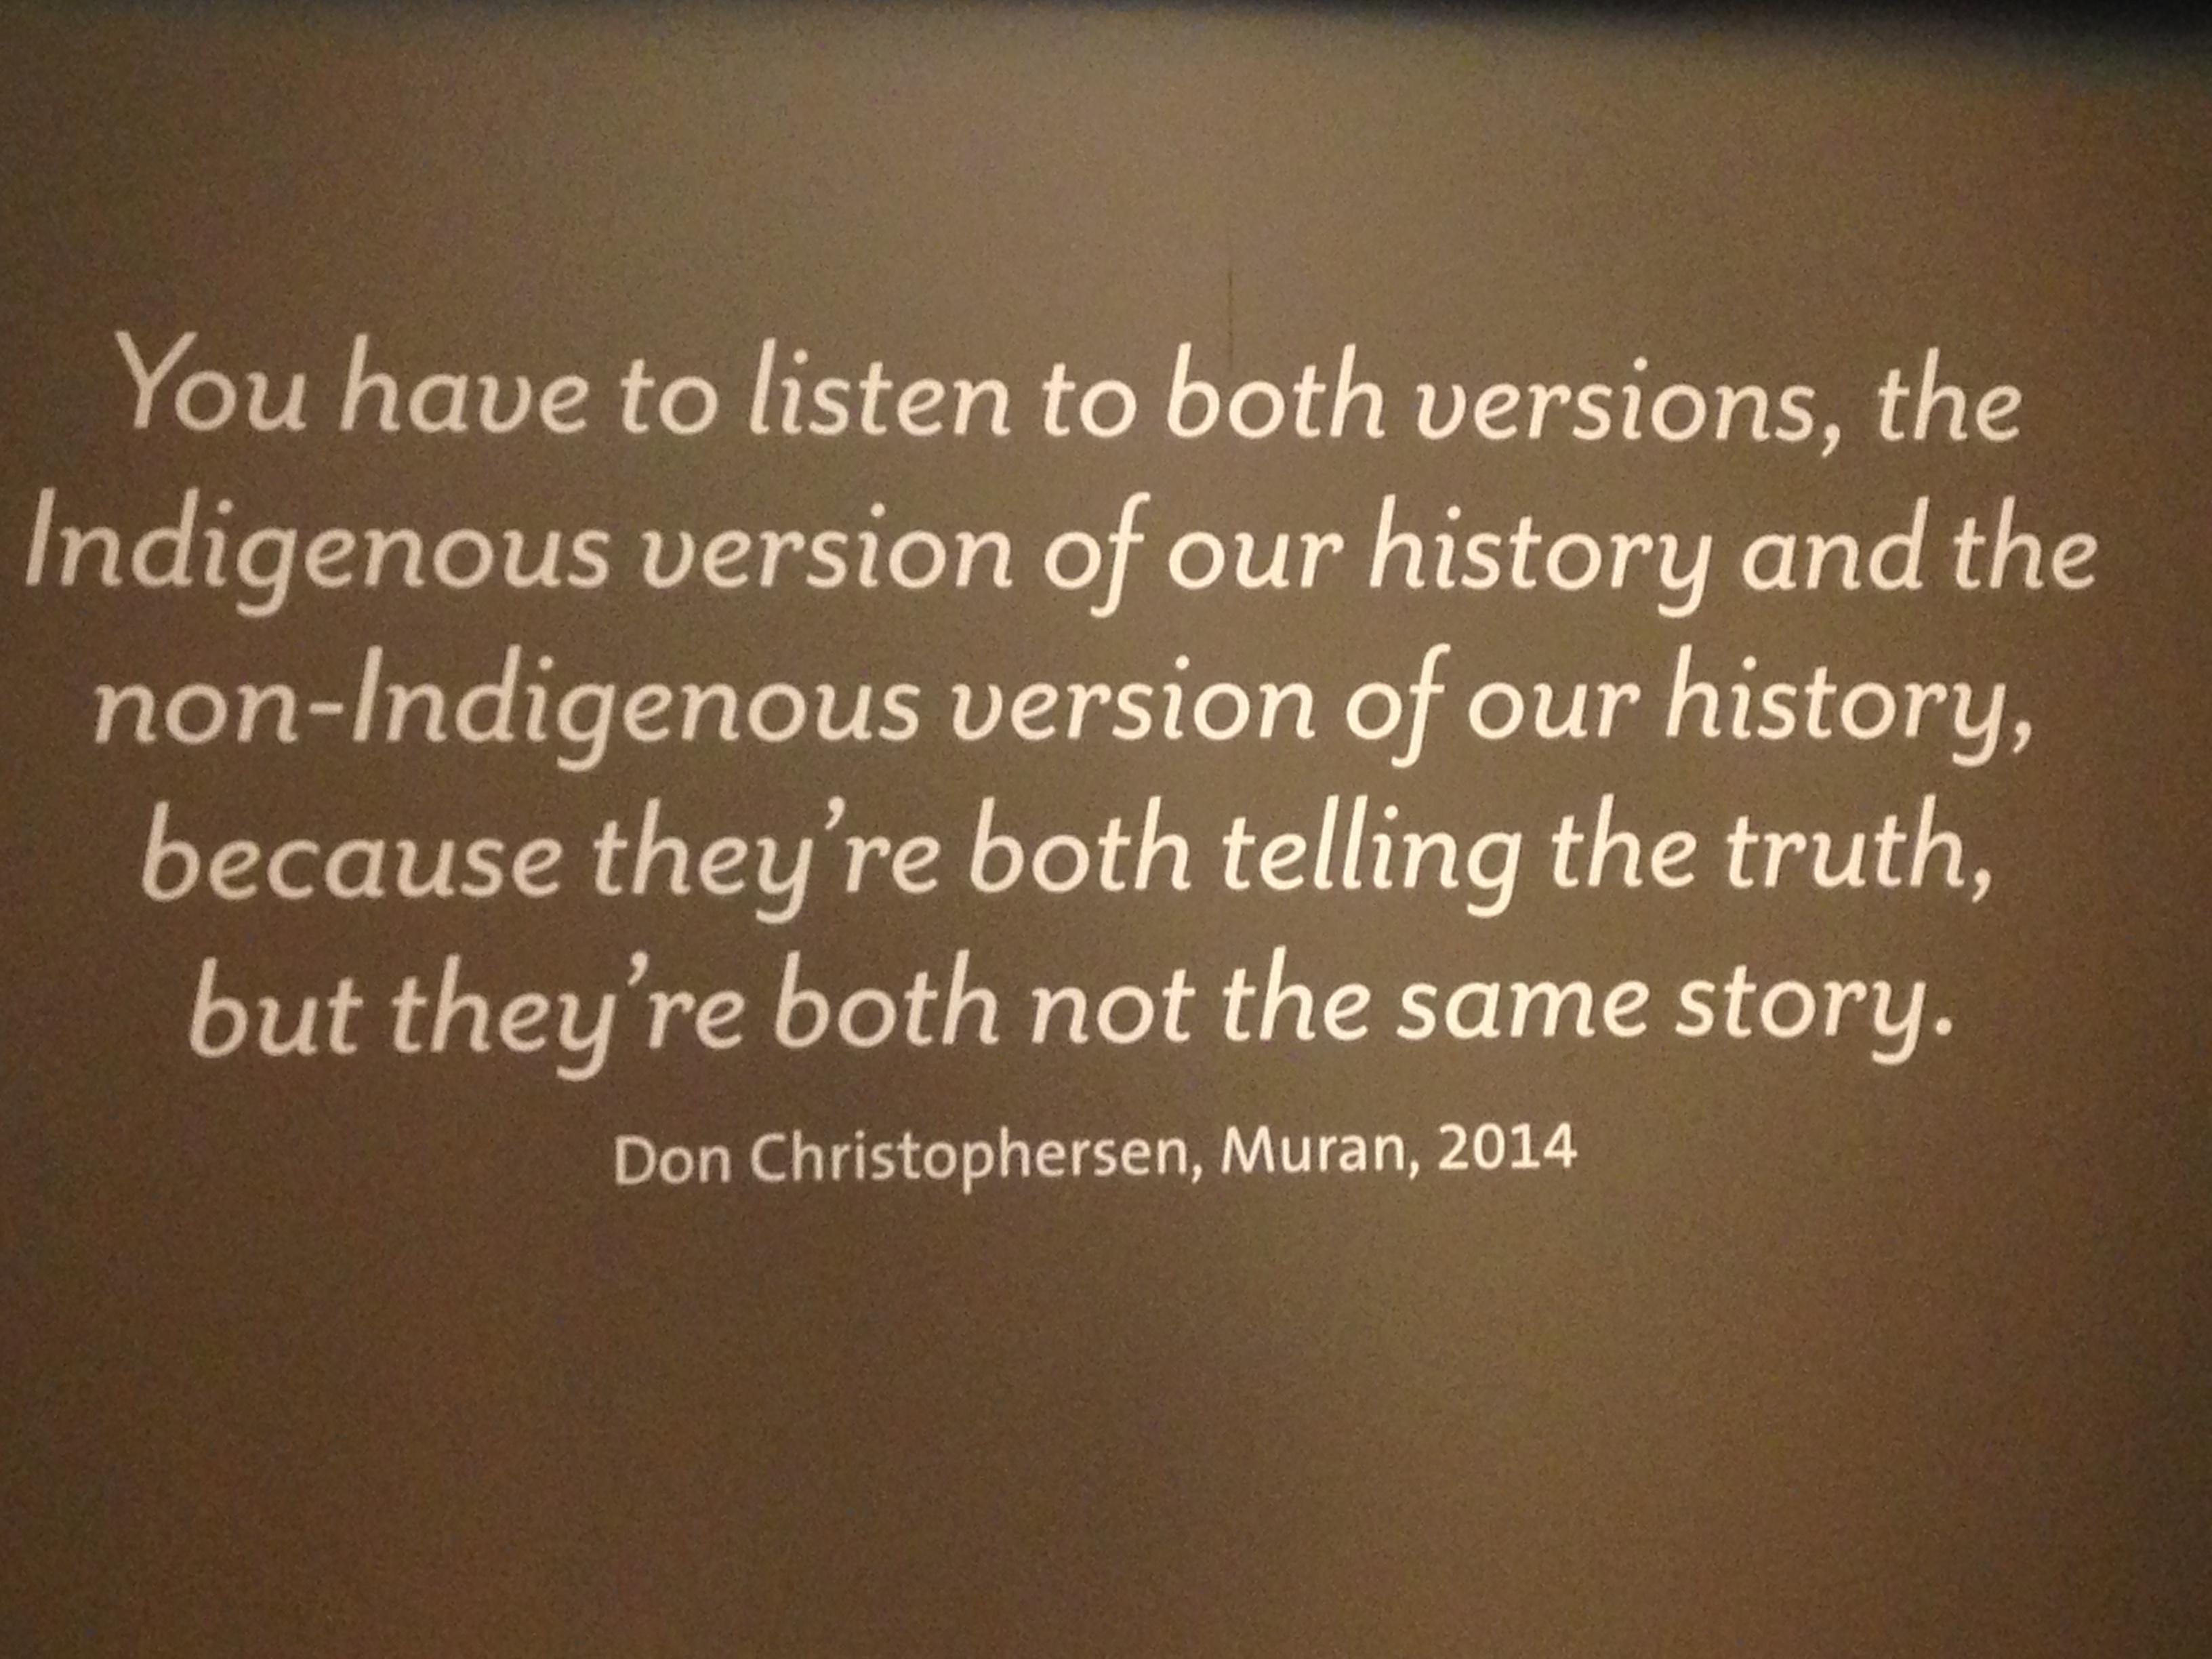 history quote .JPG